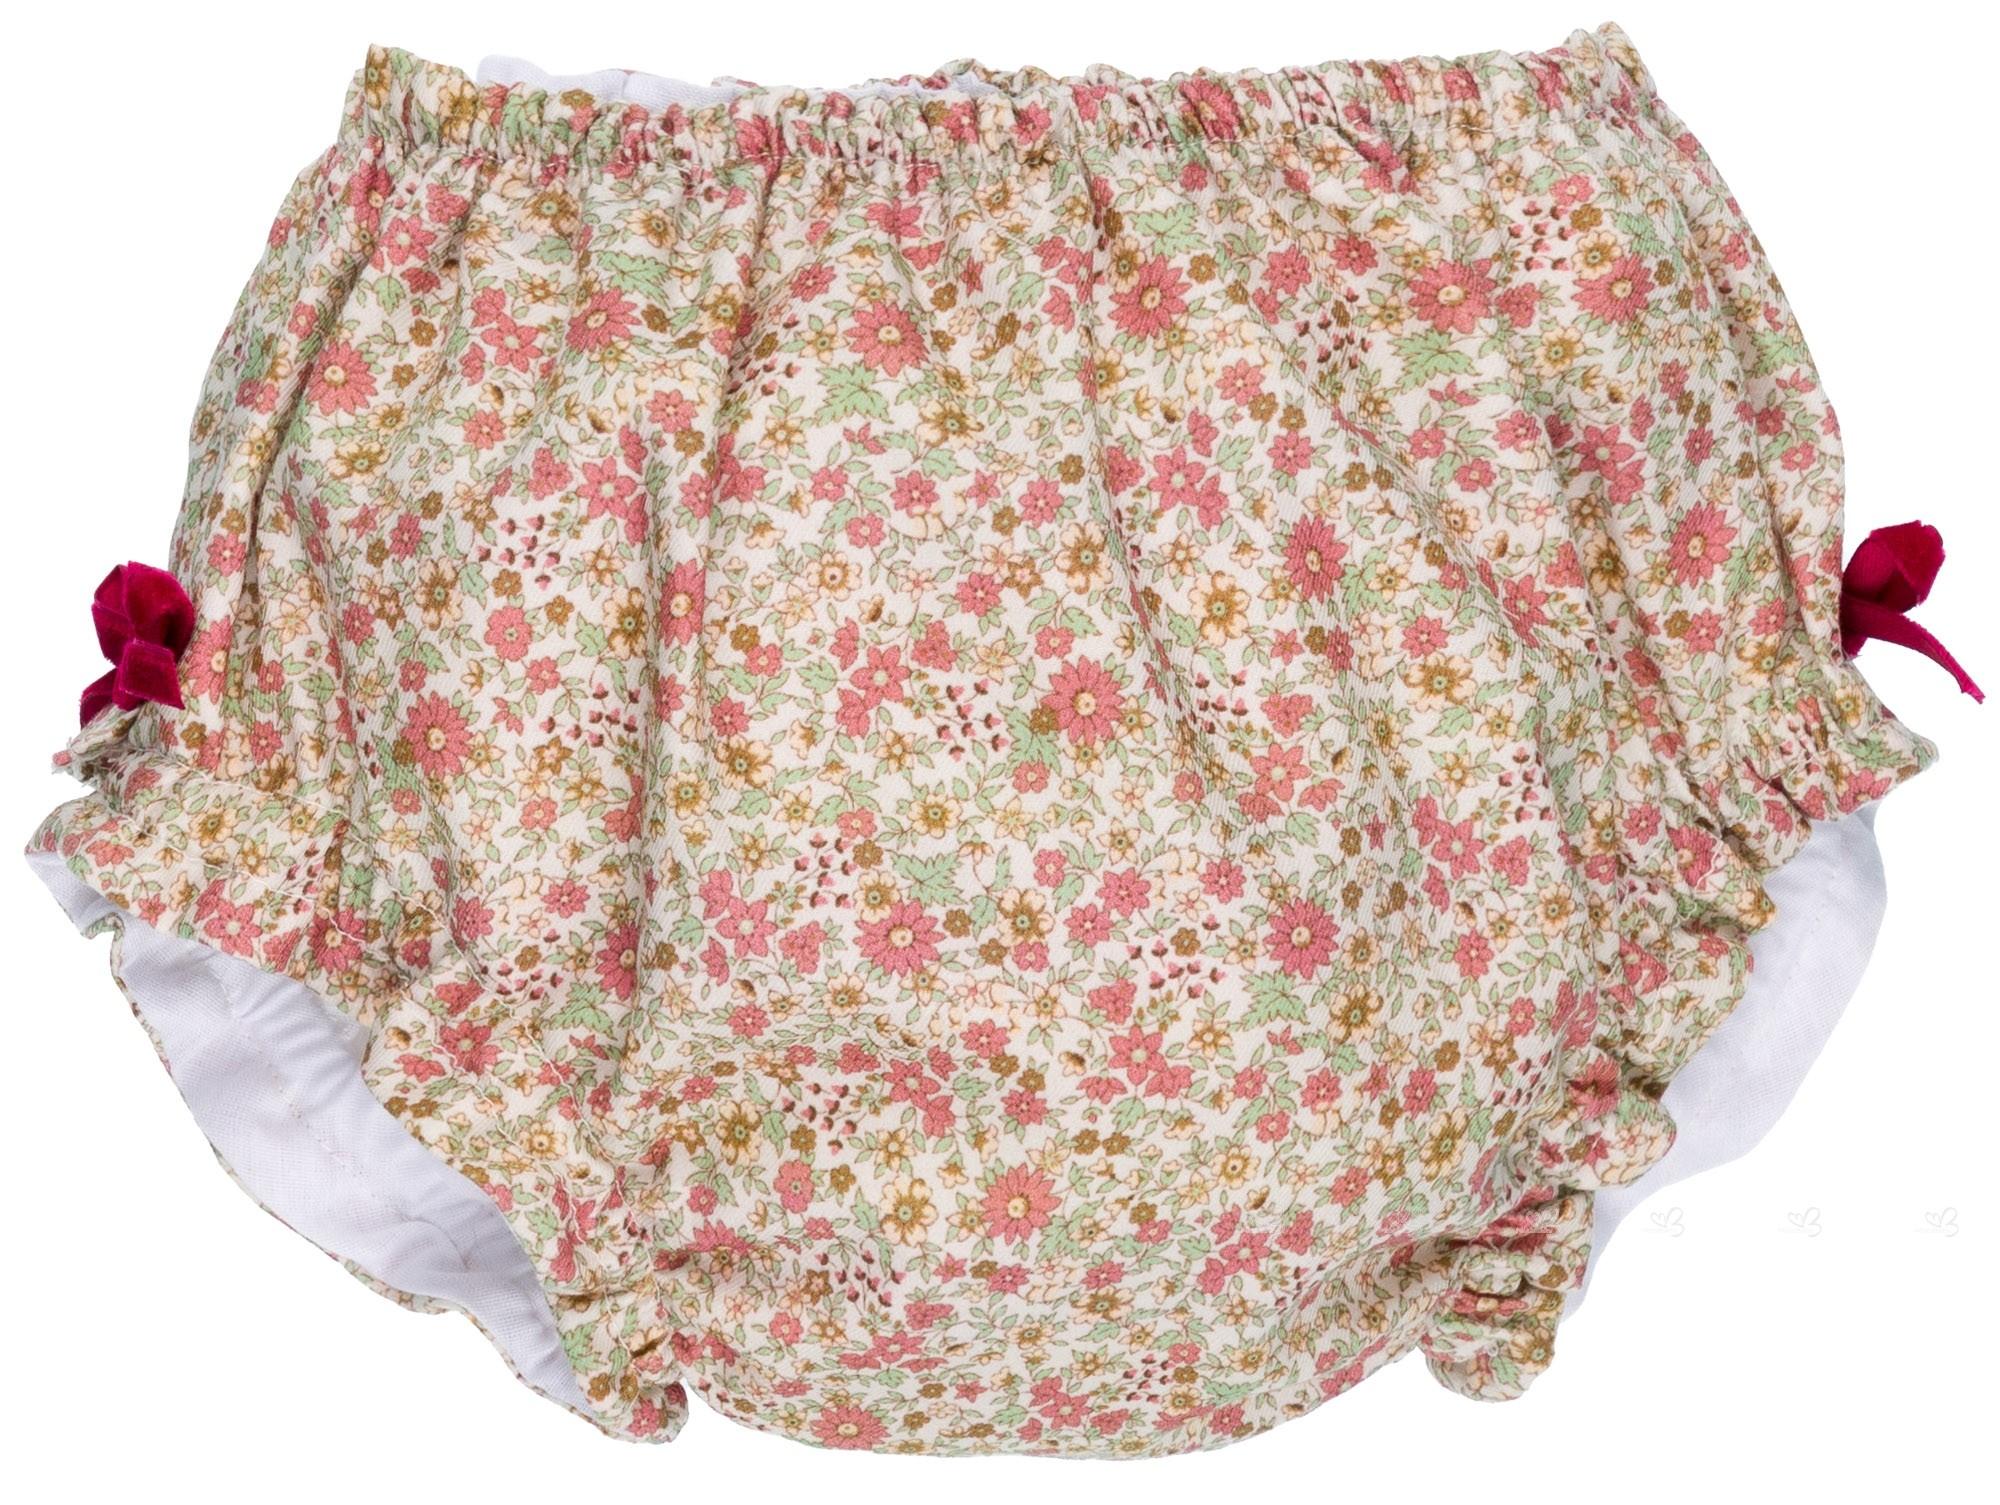 b823fe6cf0a8 Manuela Montero Baby Girls Burgundy Knitted Sweater   Flower Print ...